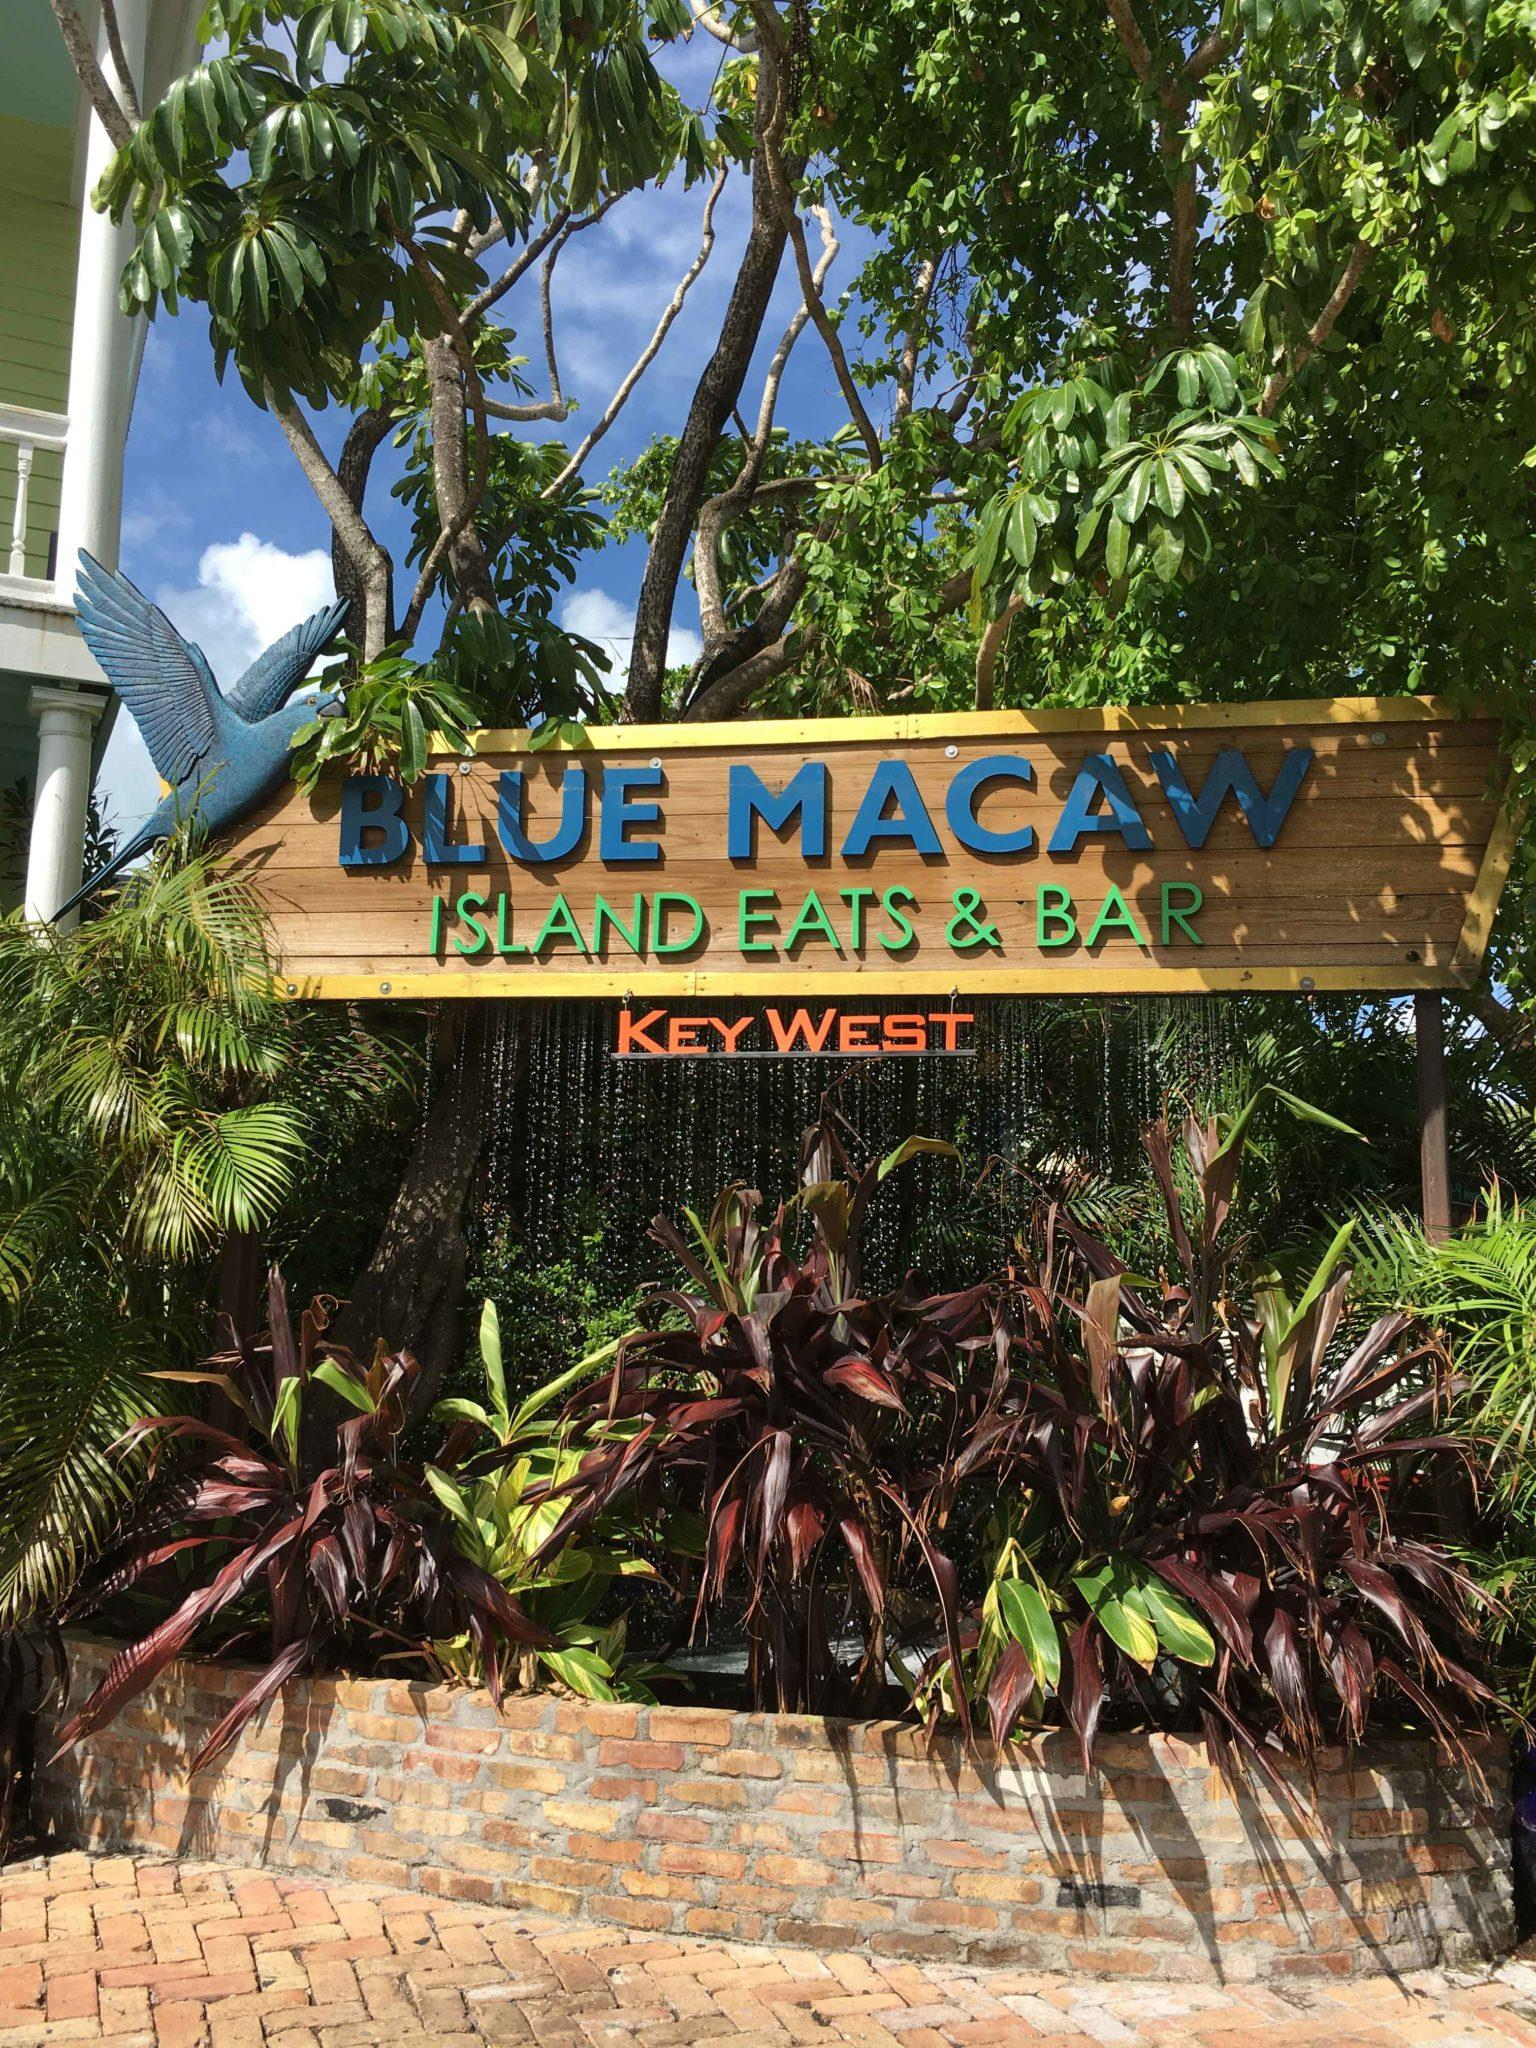 Blue Macaw Island Eats & Bar